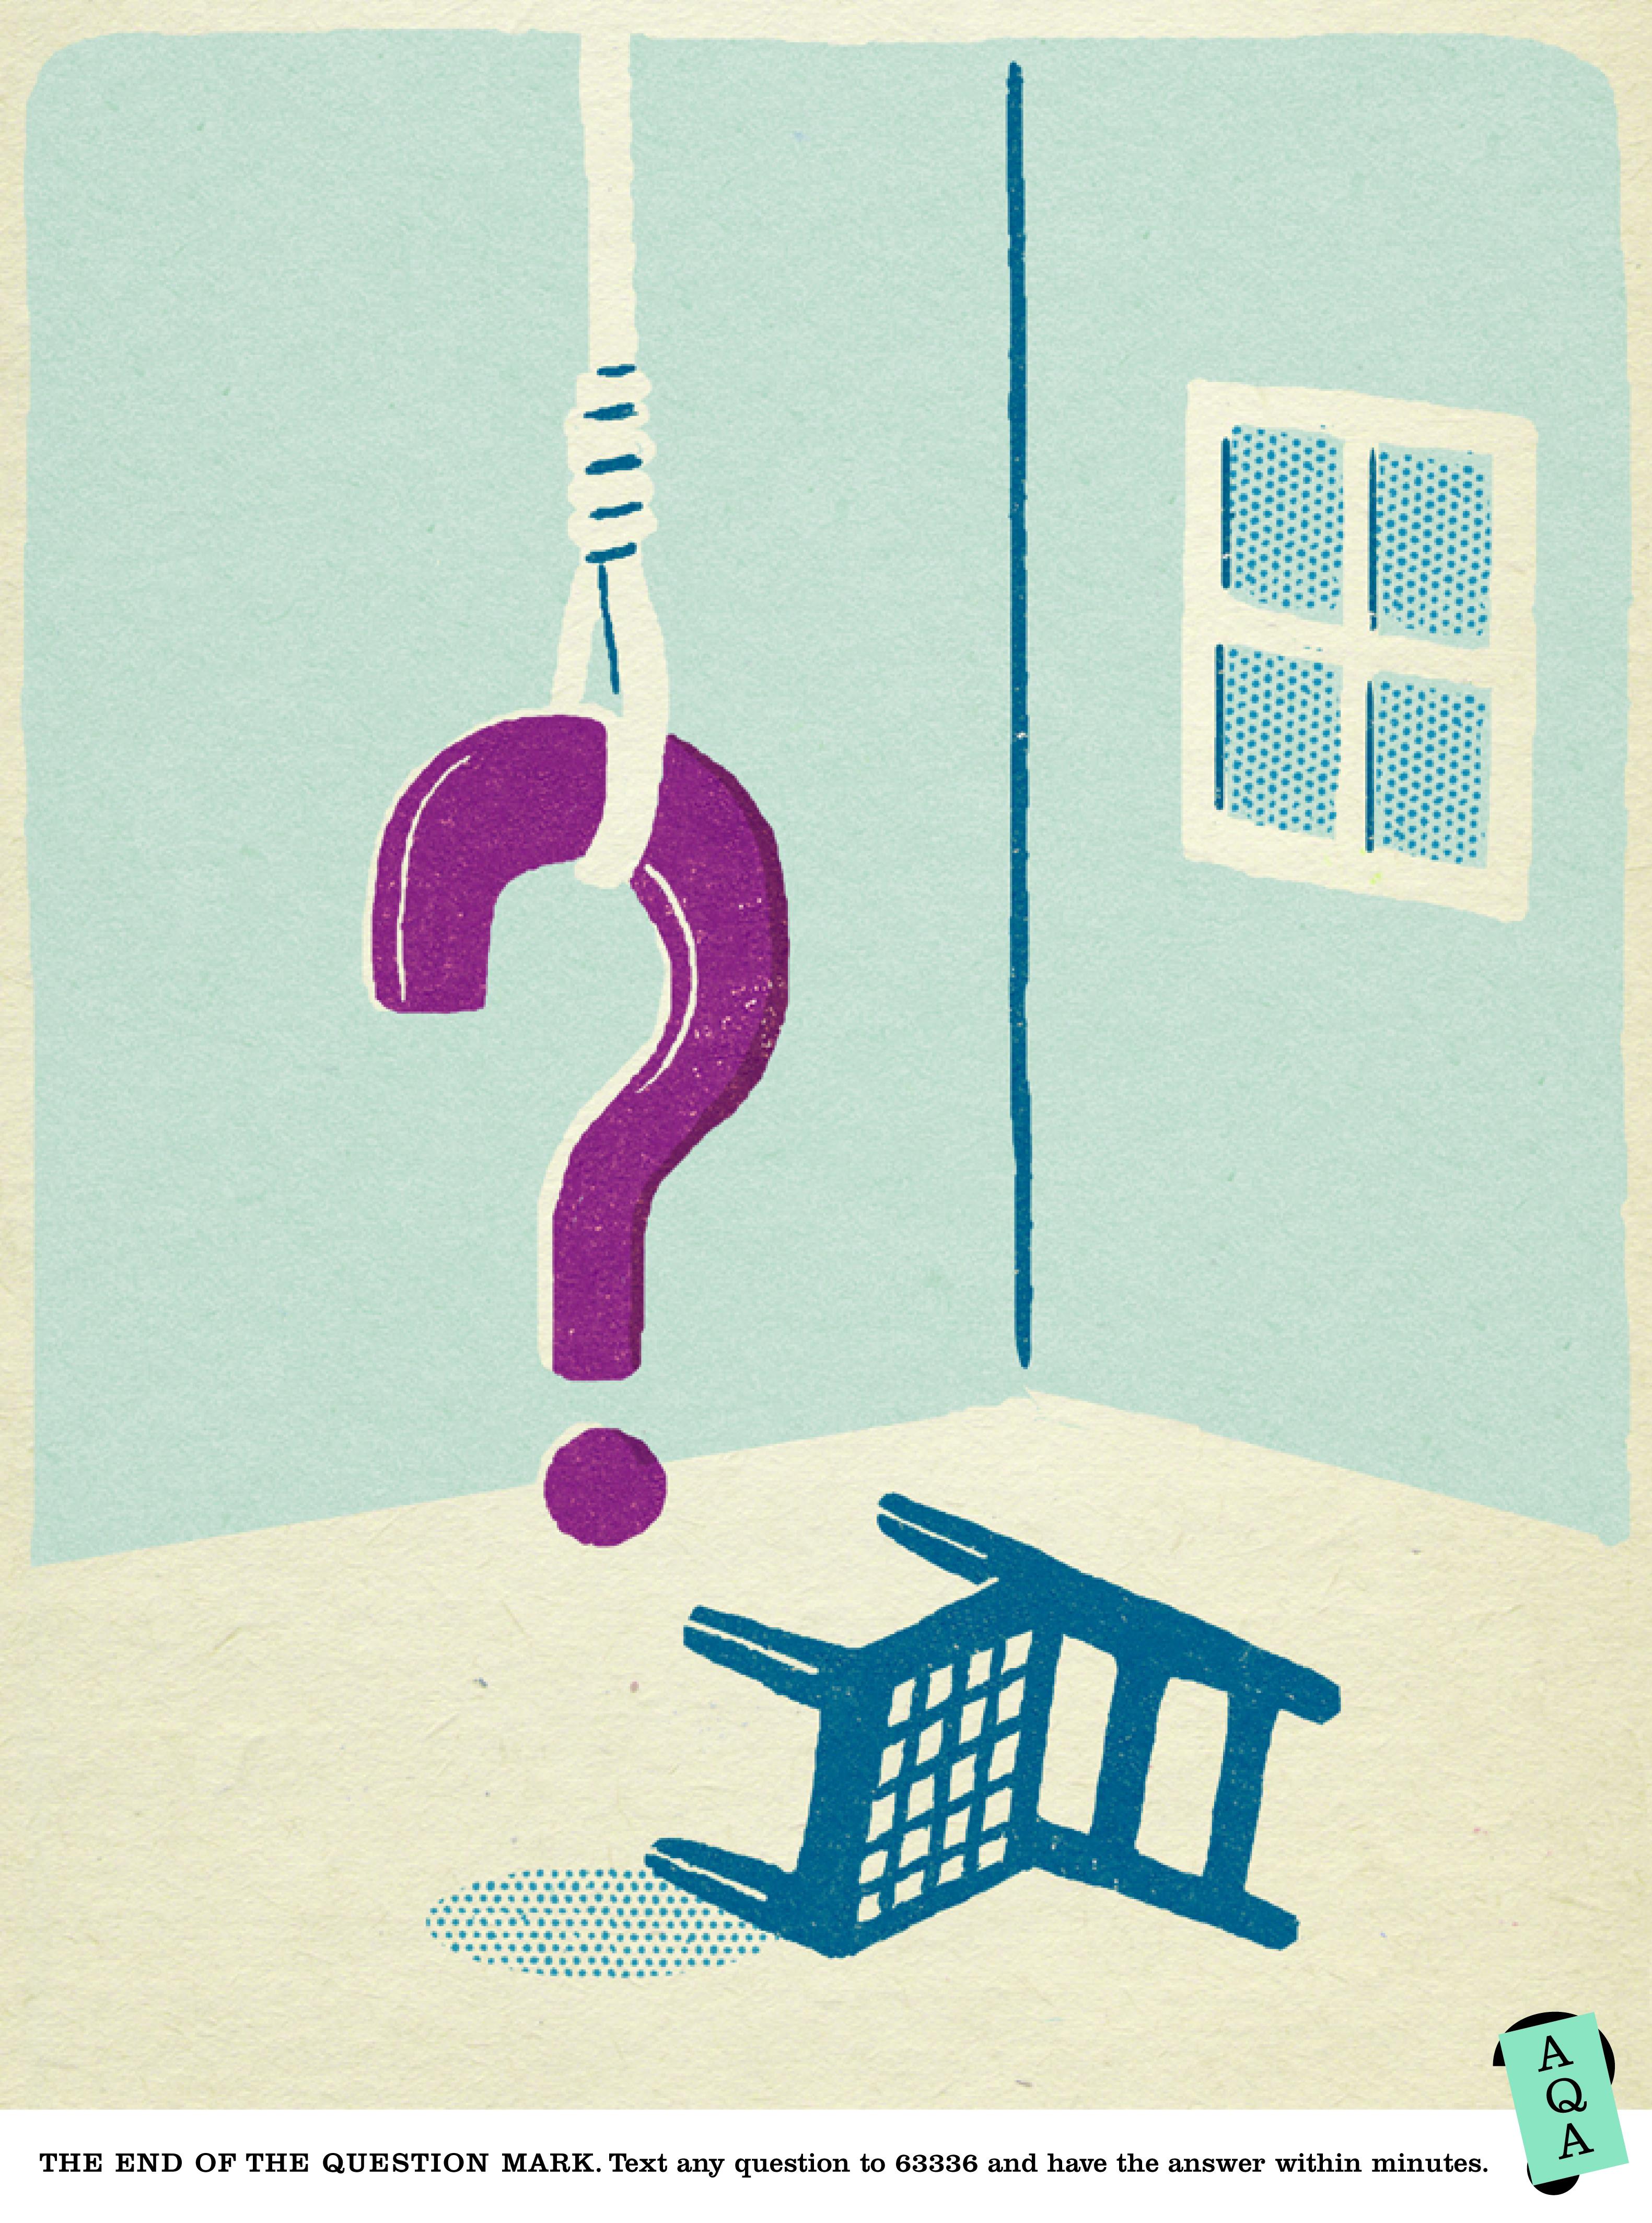 AQA, 'Hanging' ad.jpg